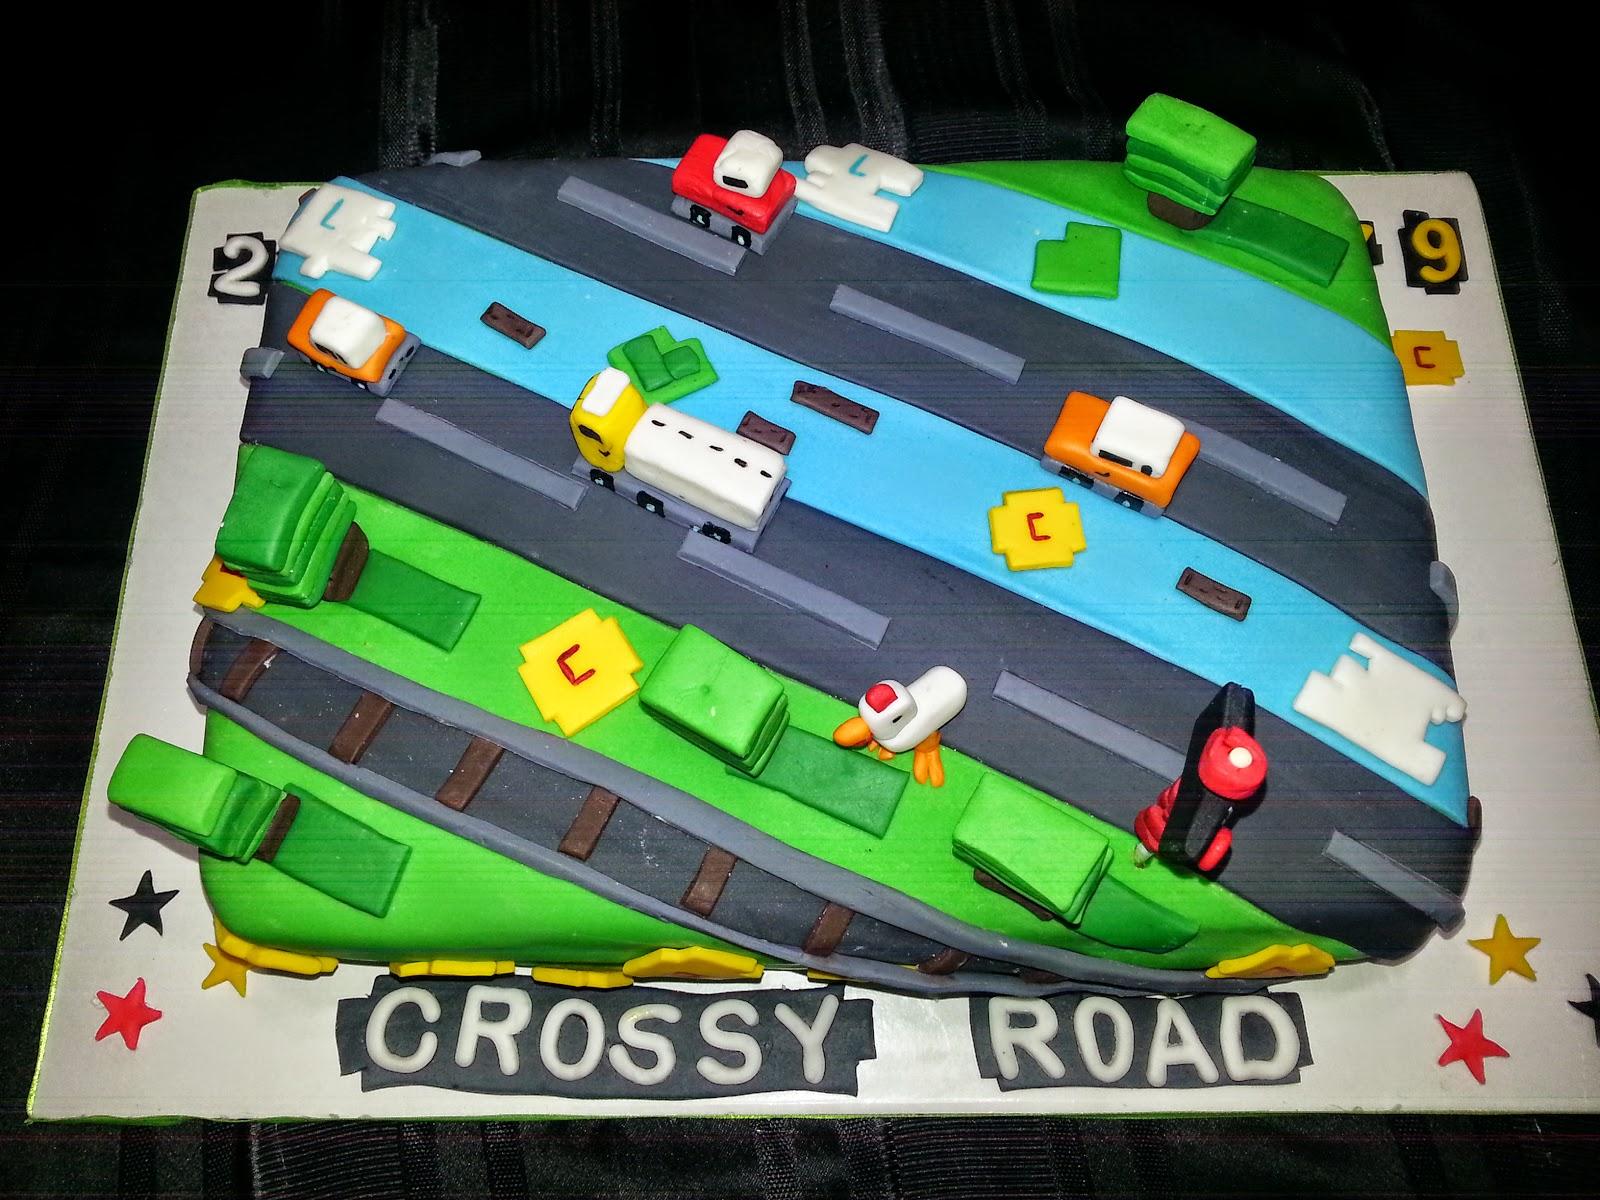 began lightly five cross roads cake kitchen should